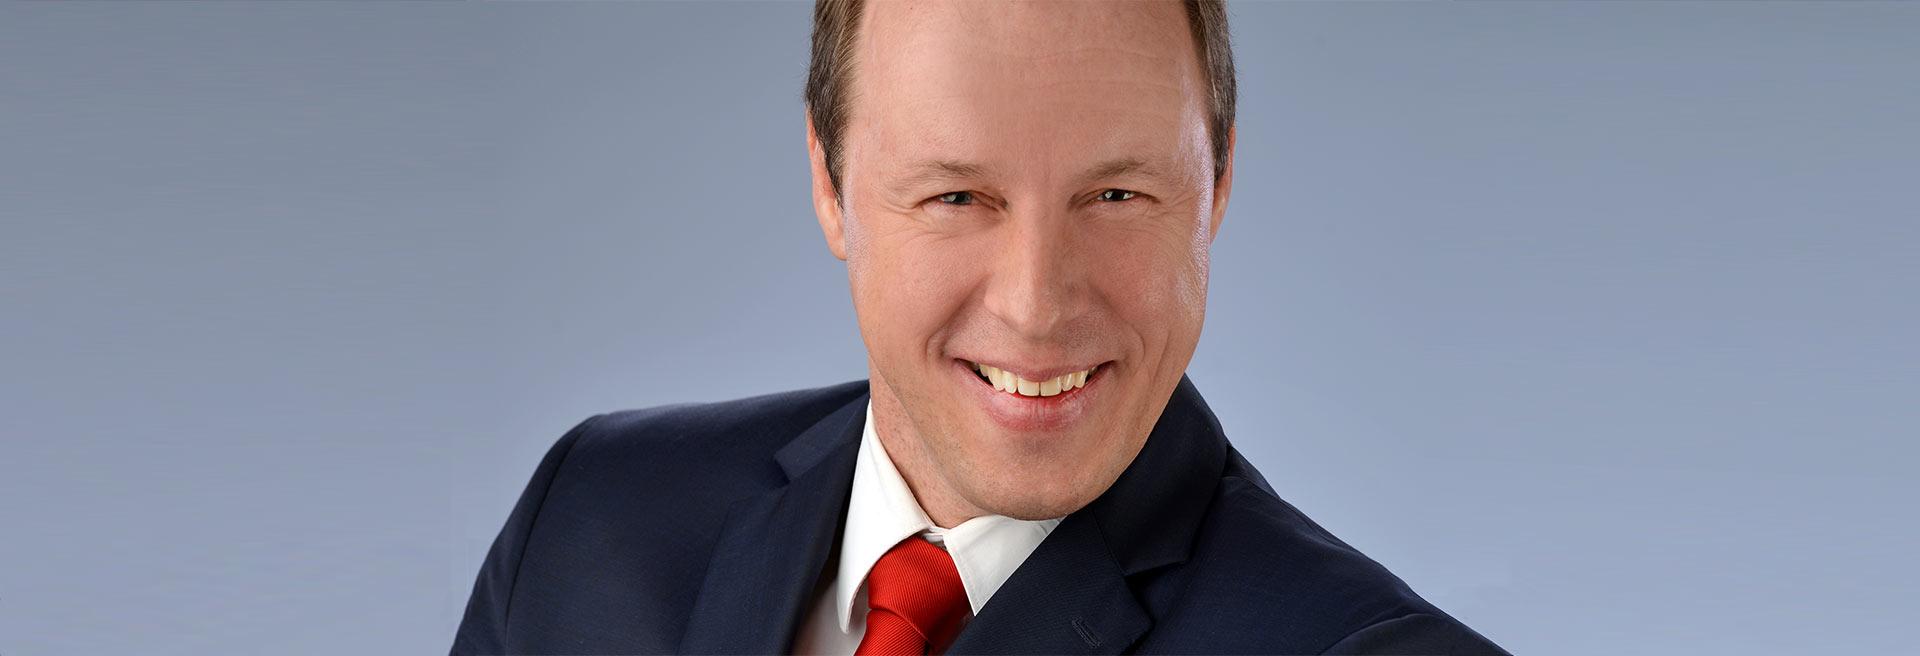 Stephan Szarvasy